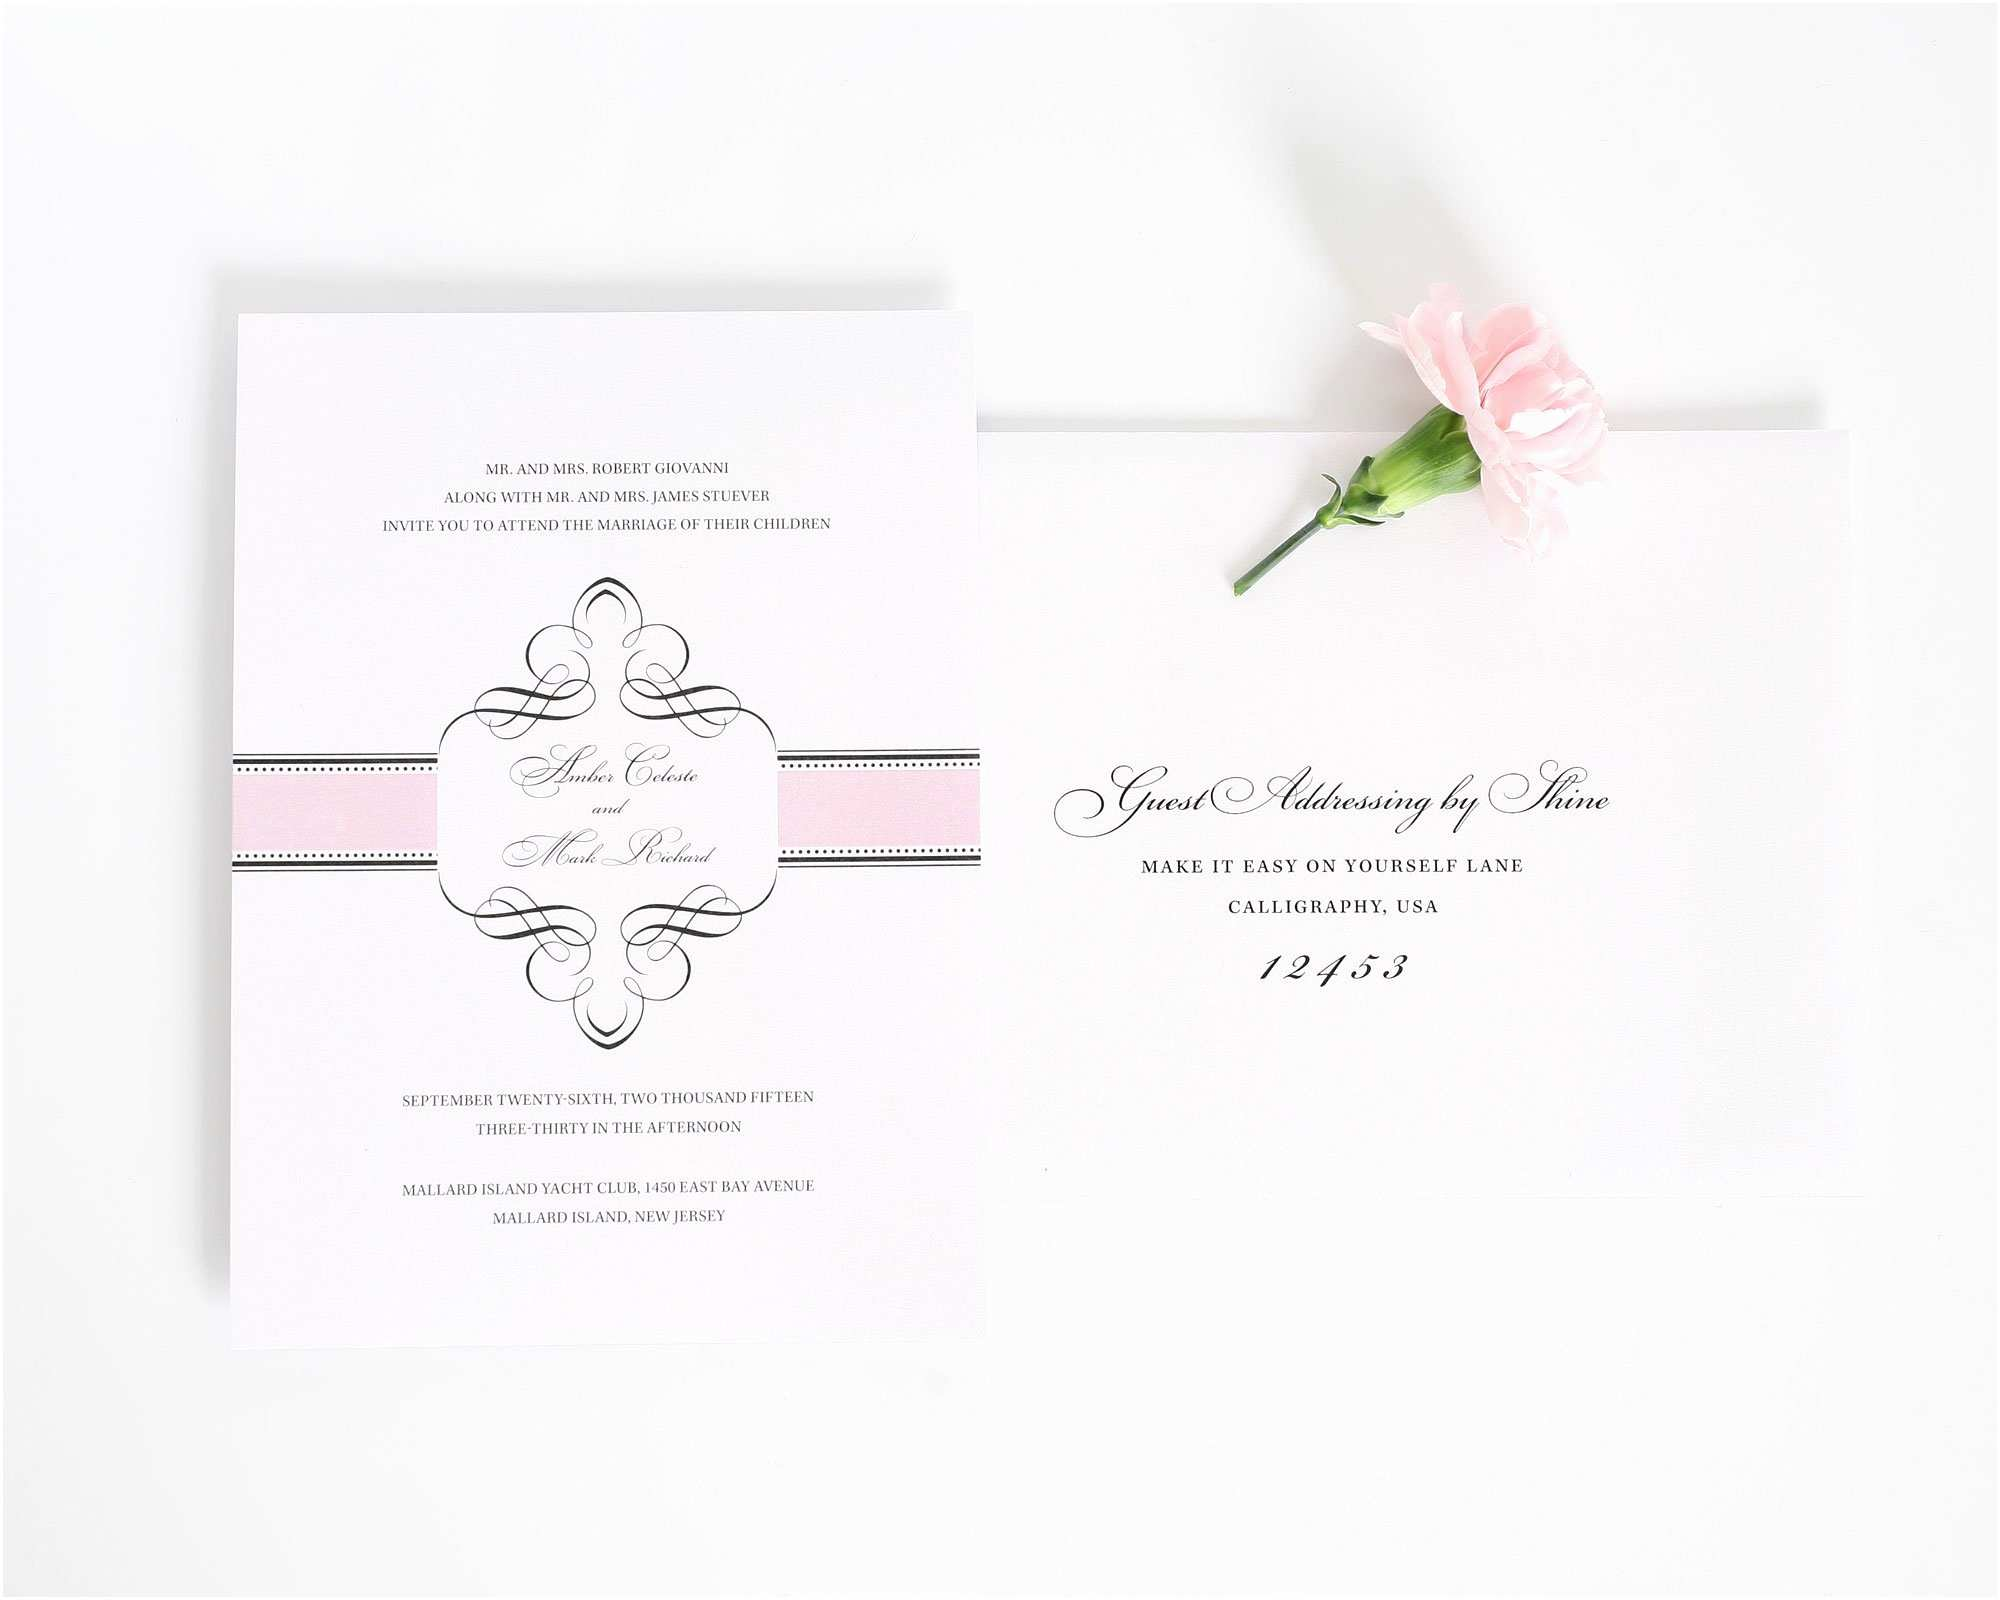 1920s Wedding Invitations 1920s Wedding Invitations In Pink – Wedding Invitations